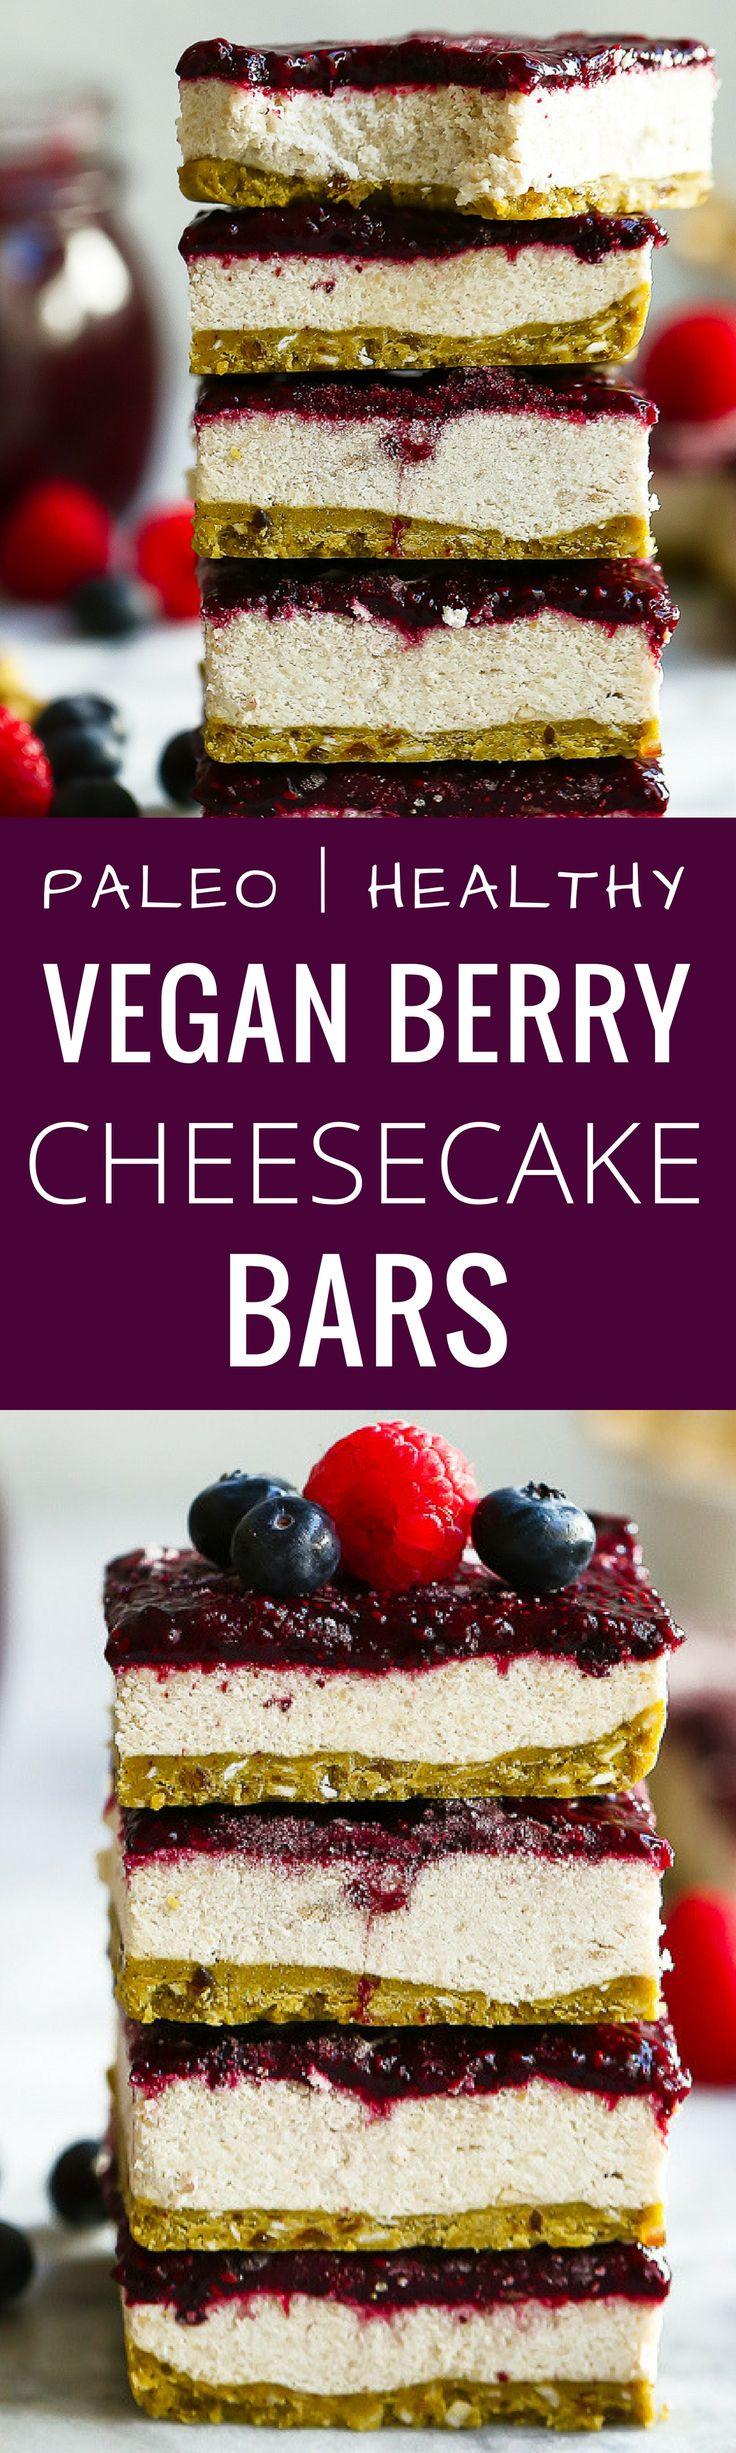 Paleo Vegan Berry Cheesecake Bars. These cheesecake bars are easy to make, taste delicious and are gluten free, grain free, dairy free and sugar free! Low carb cheesecake bars. No bake cheesecake bars. Best paleo vegan cheesecake bars recipe here. Easy vegan cheesecake recipes. Paleo cheesecake recipe. via @themovementmenu